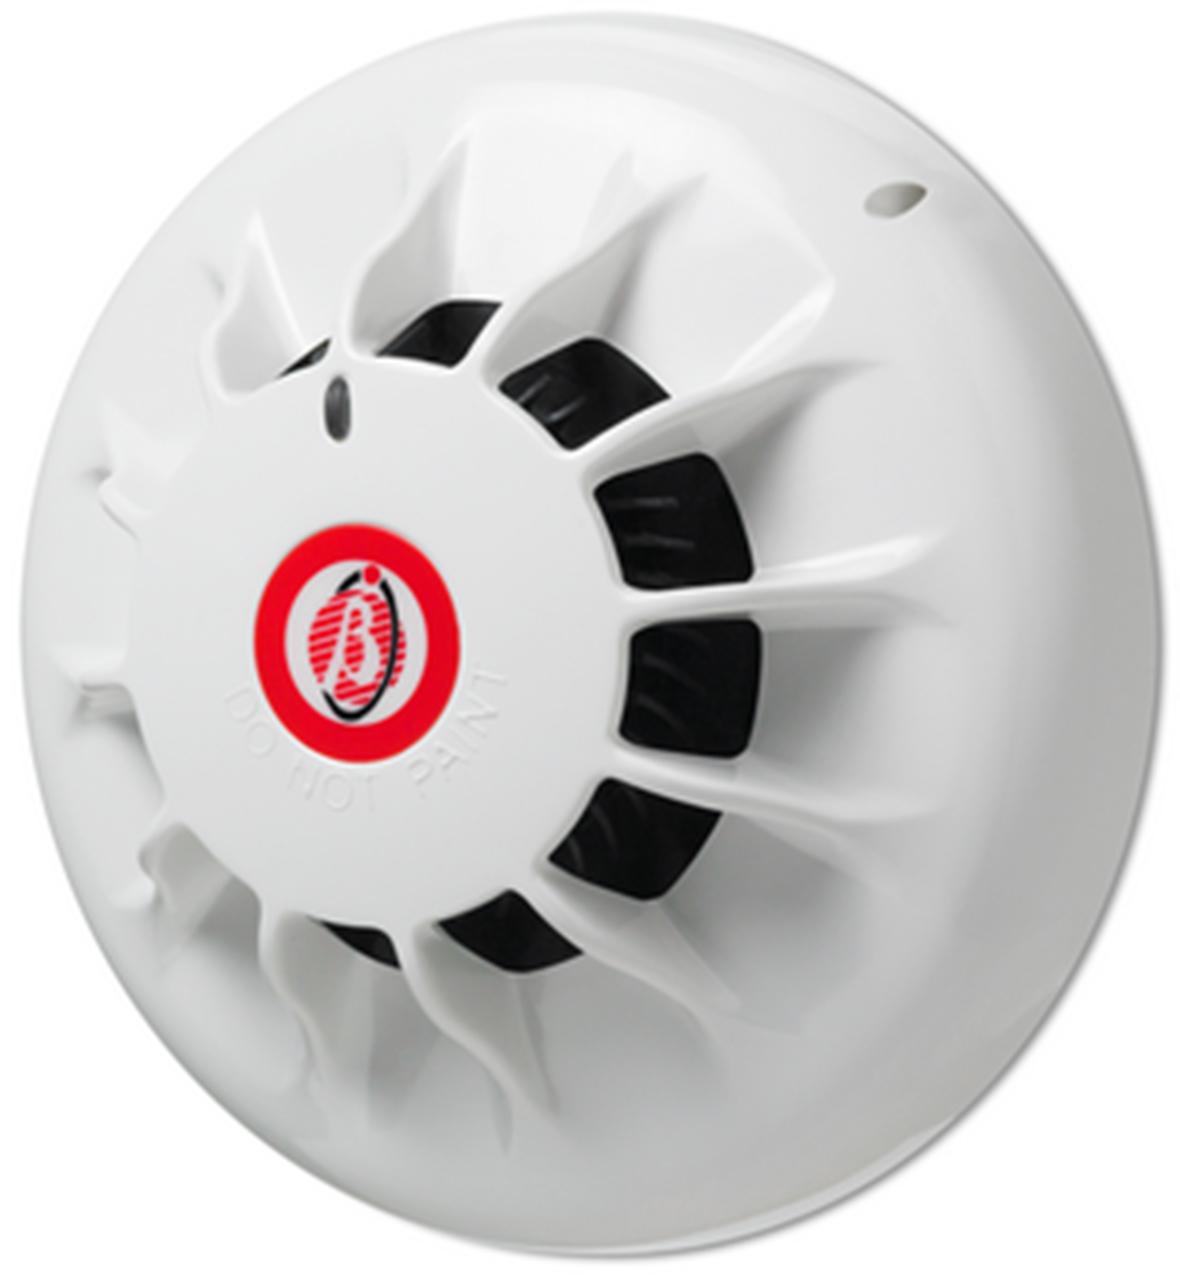 Bentel 601P - Photo Optical Smoke Detector Armenia Vantag LLC